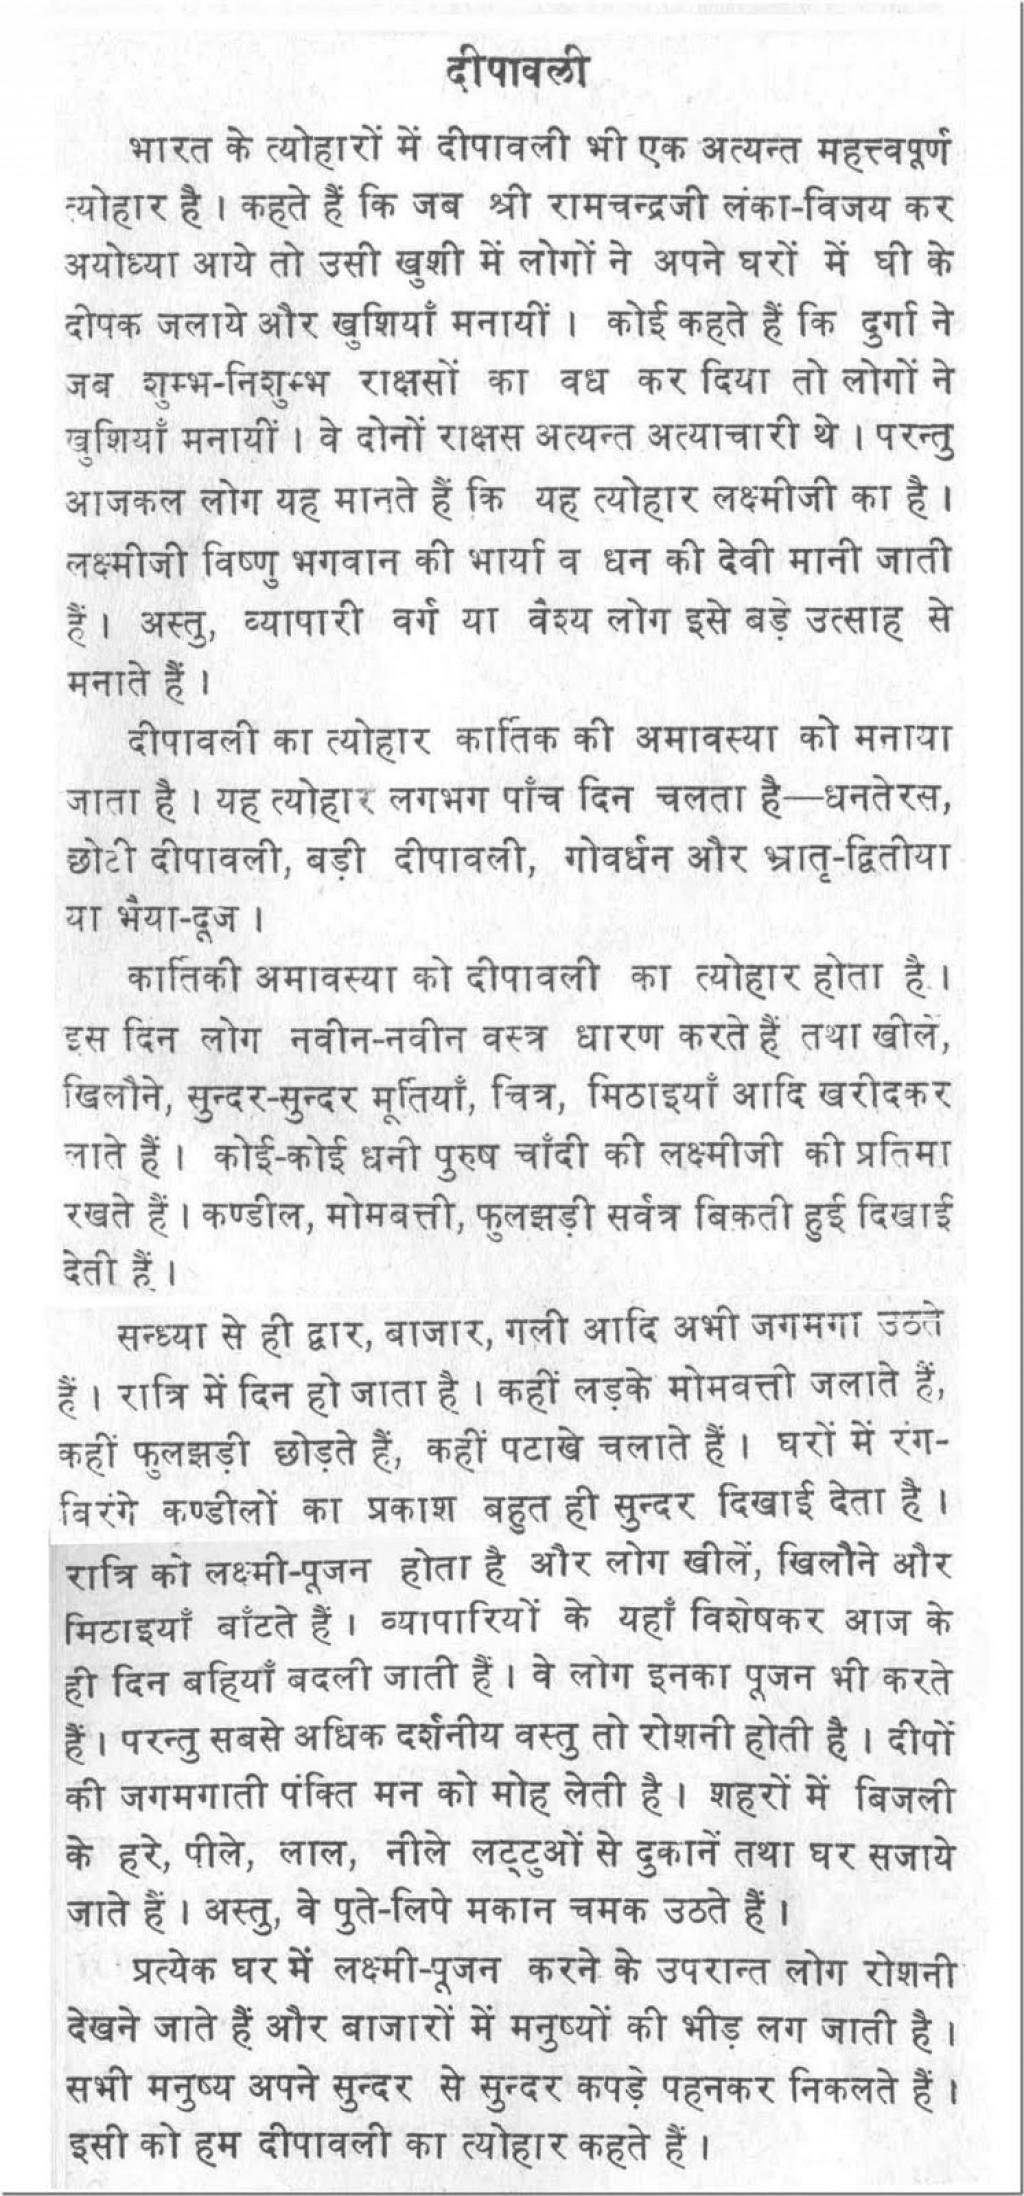 017 Essay Example Diwali20esay20in20hindi Hard Wonderful Work Pdf Pays Off In Hindi Writing Large